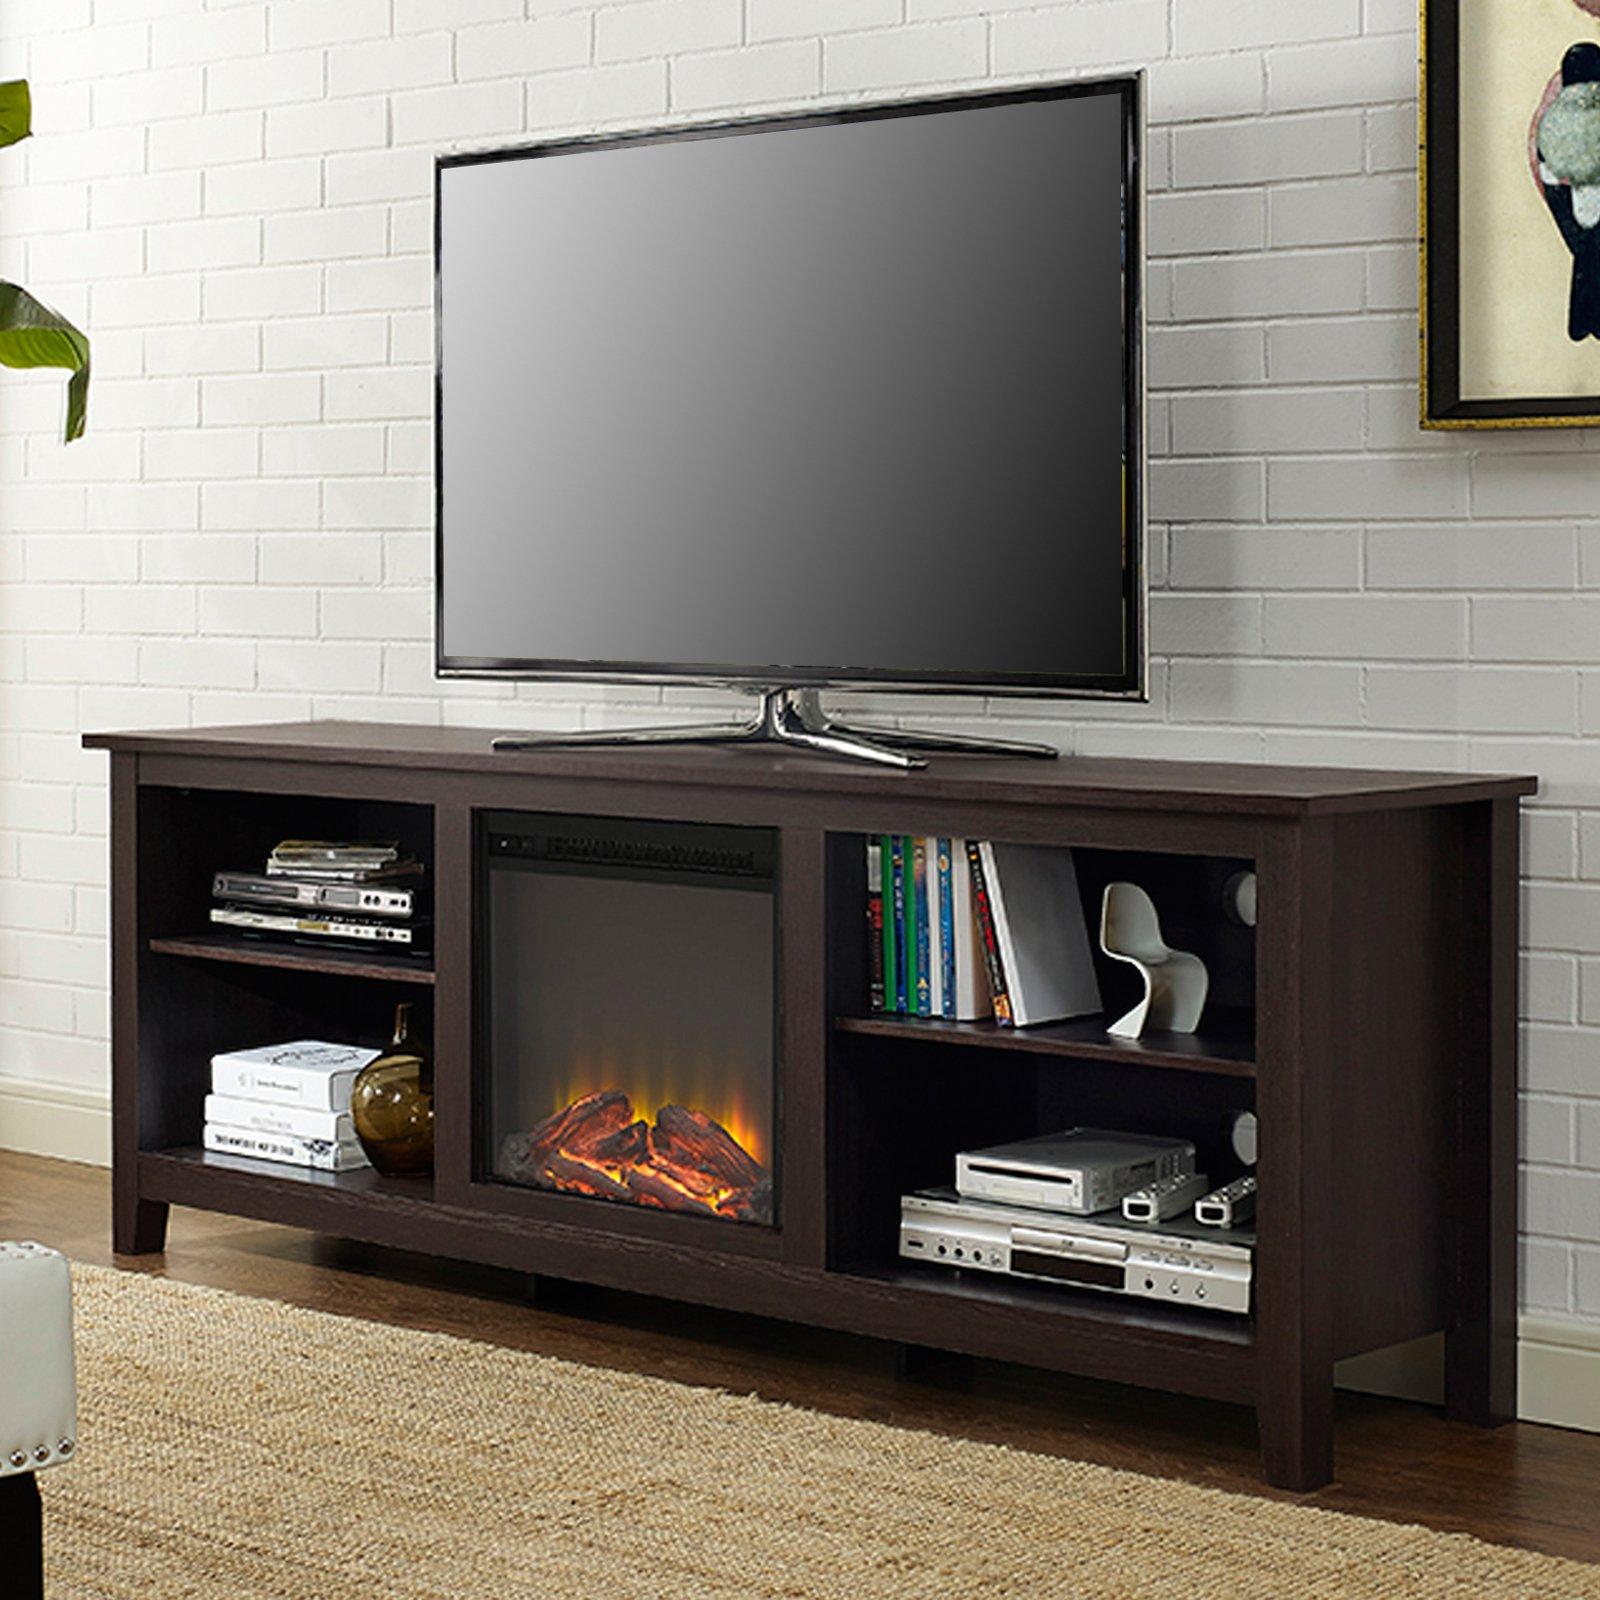 Belham Living Richardson 70 in. Fireplace TV Stand